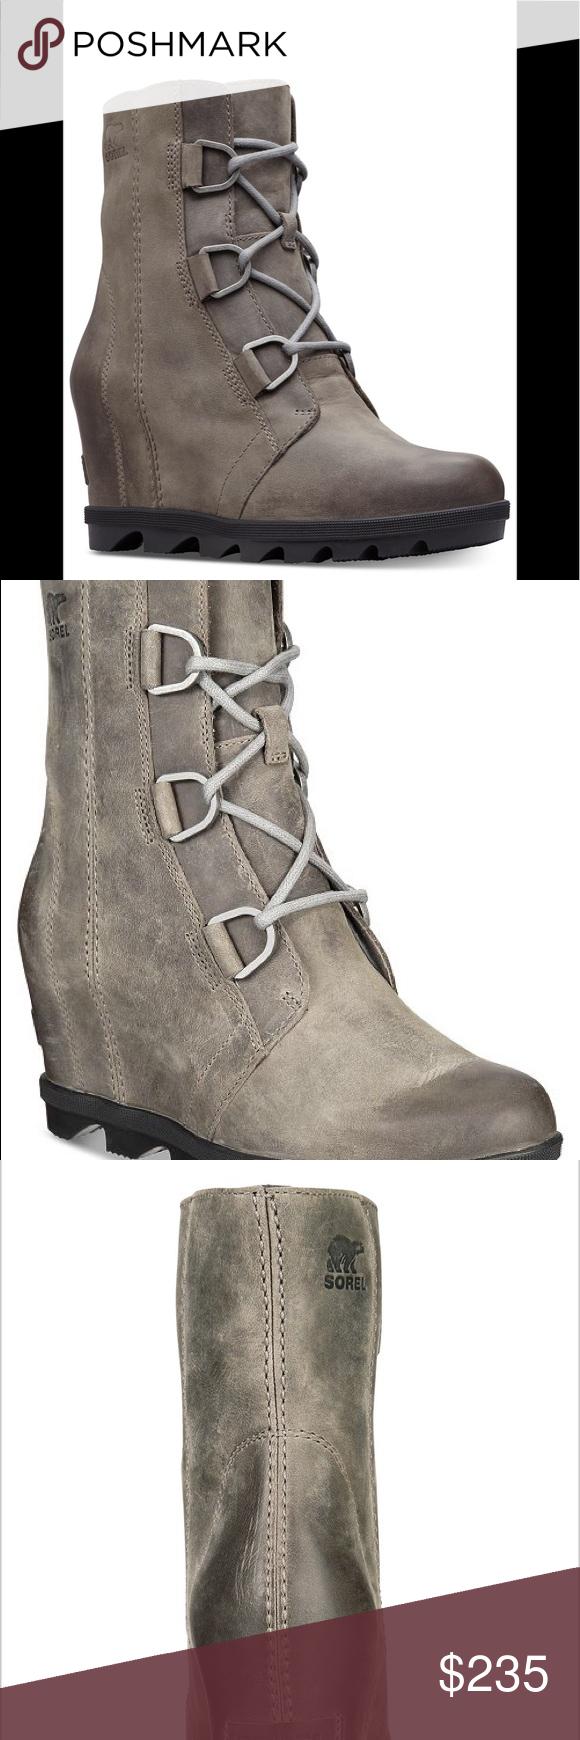 334933ce330 Sorel Joan of Arctic Wedge II Sorel Joan of Arctic Wedge II Sorel Shoes  Wedges